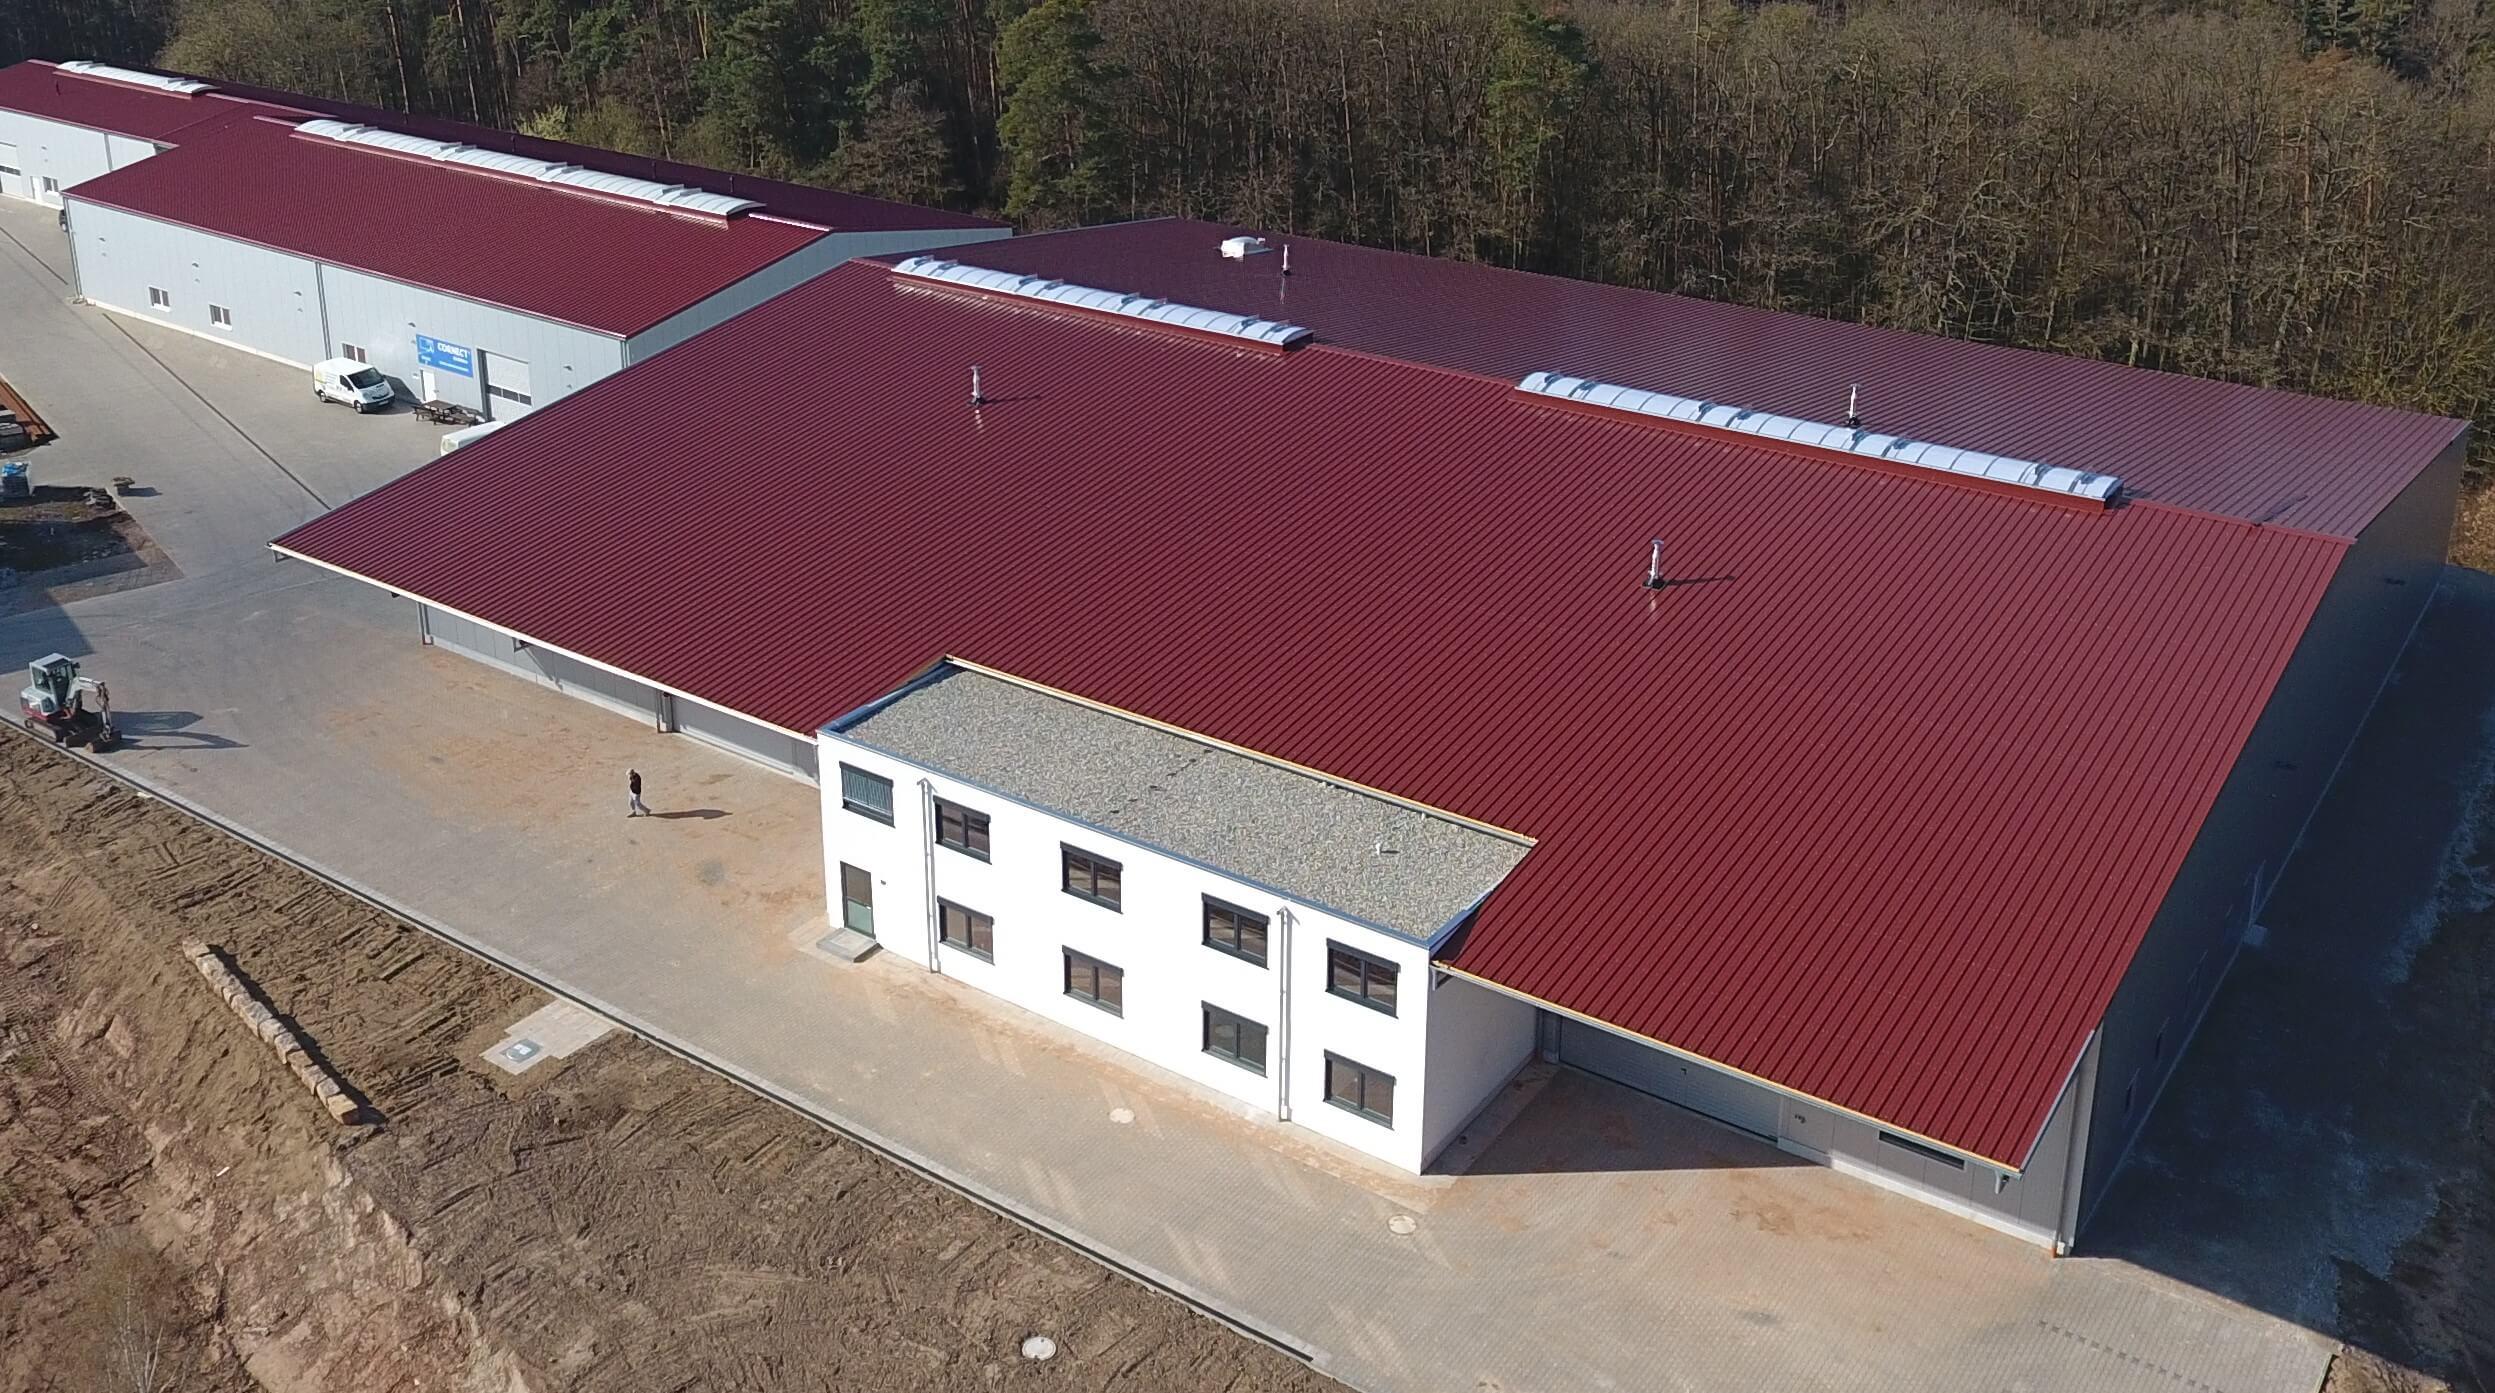 Feldmann neue Halle gebaut, Logistik, Lagerplatz, Edelstahllager